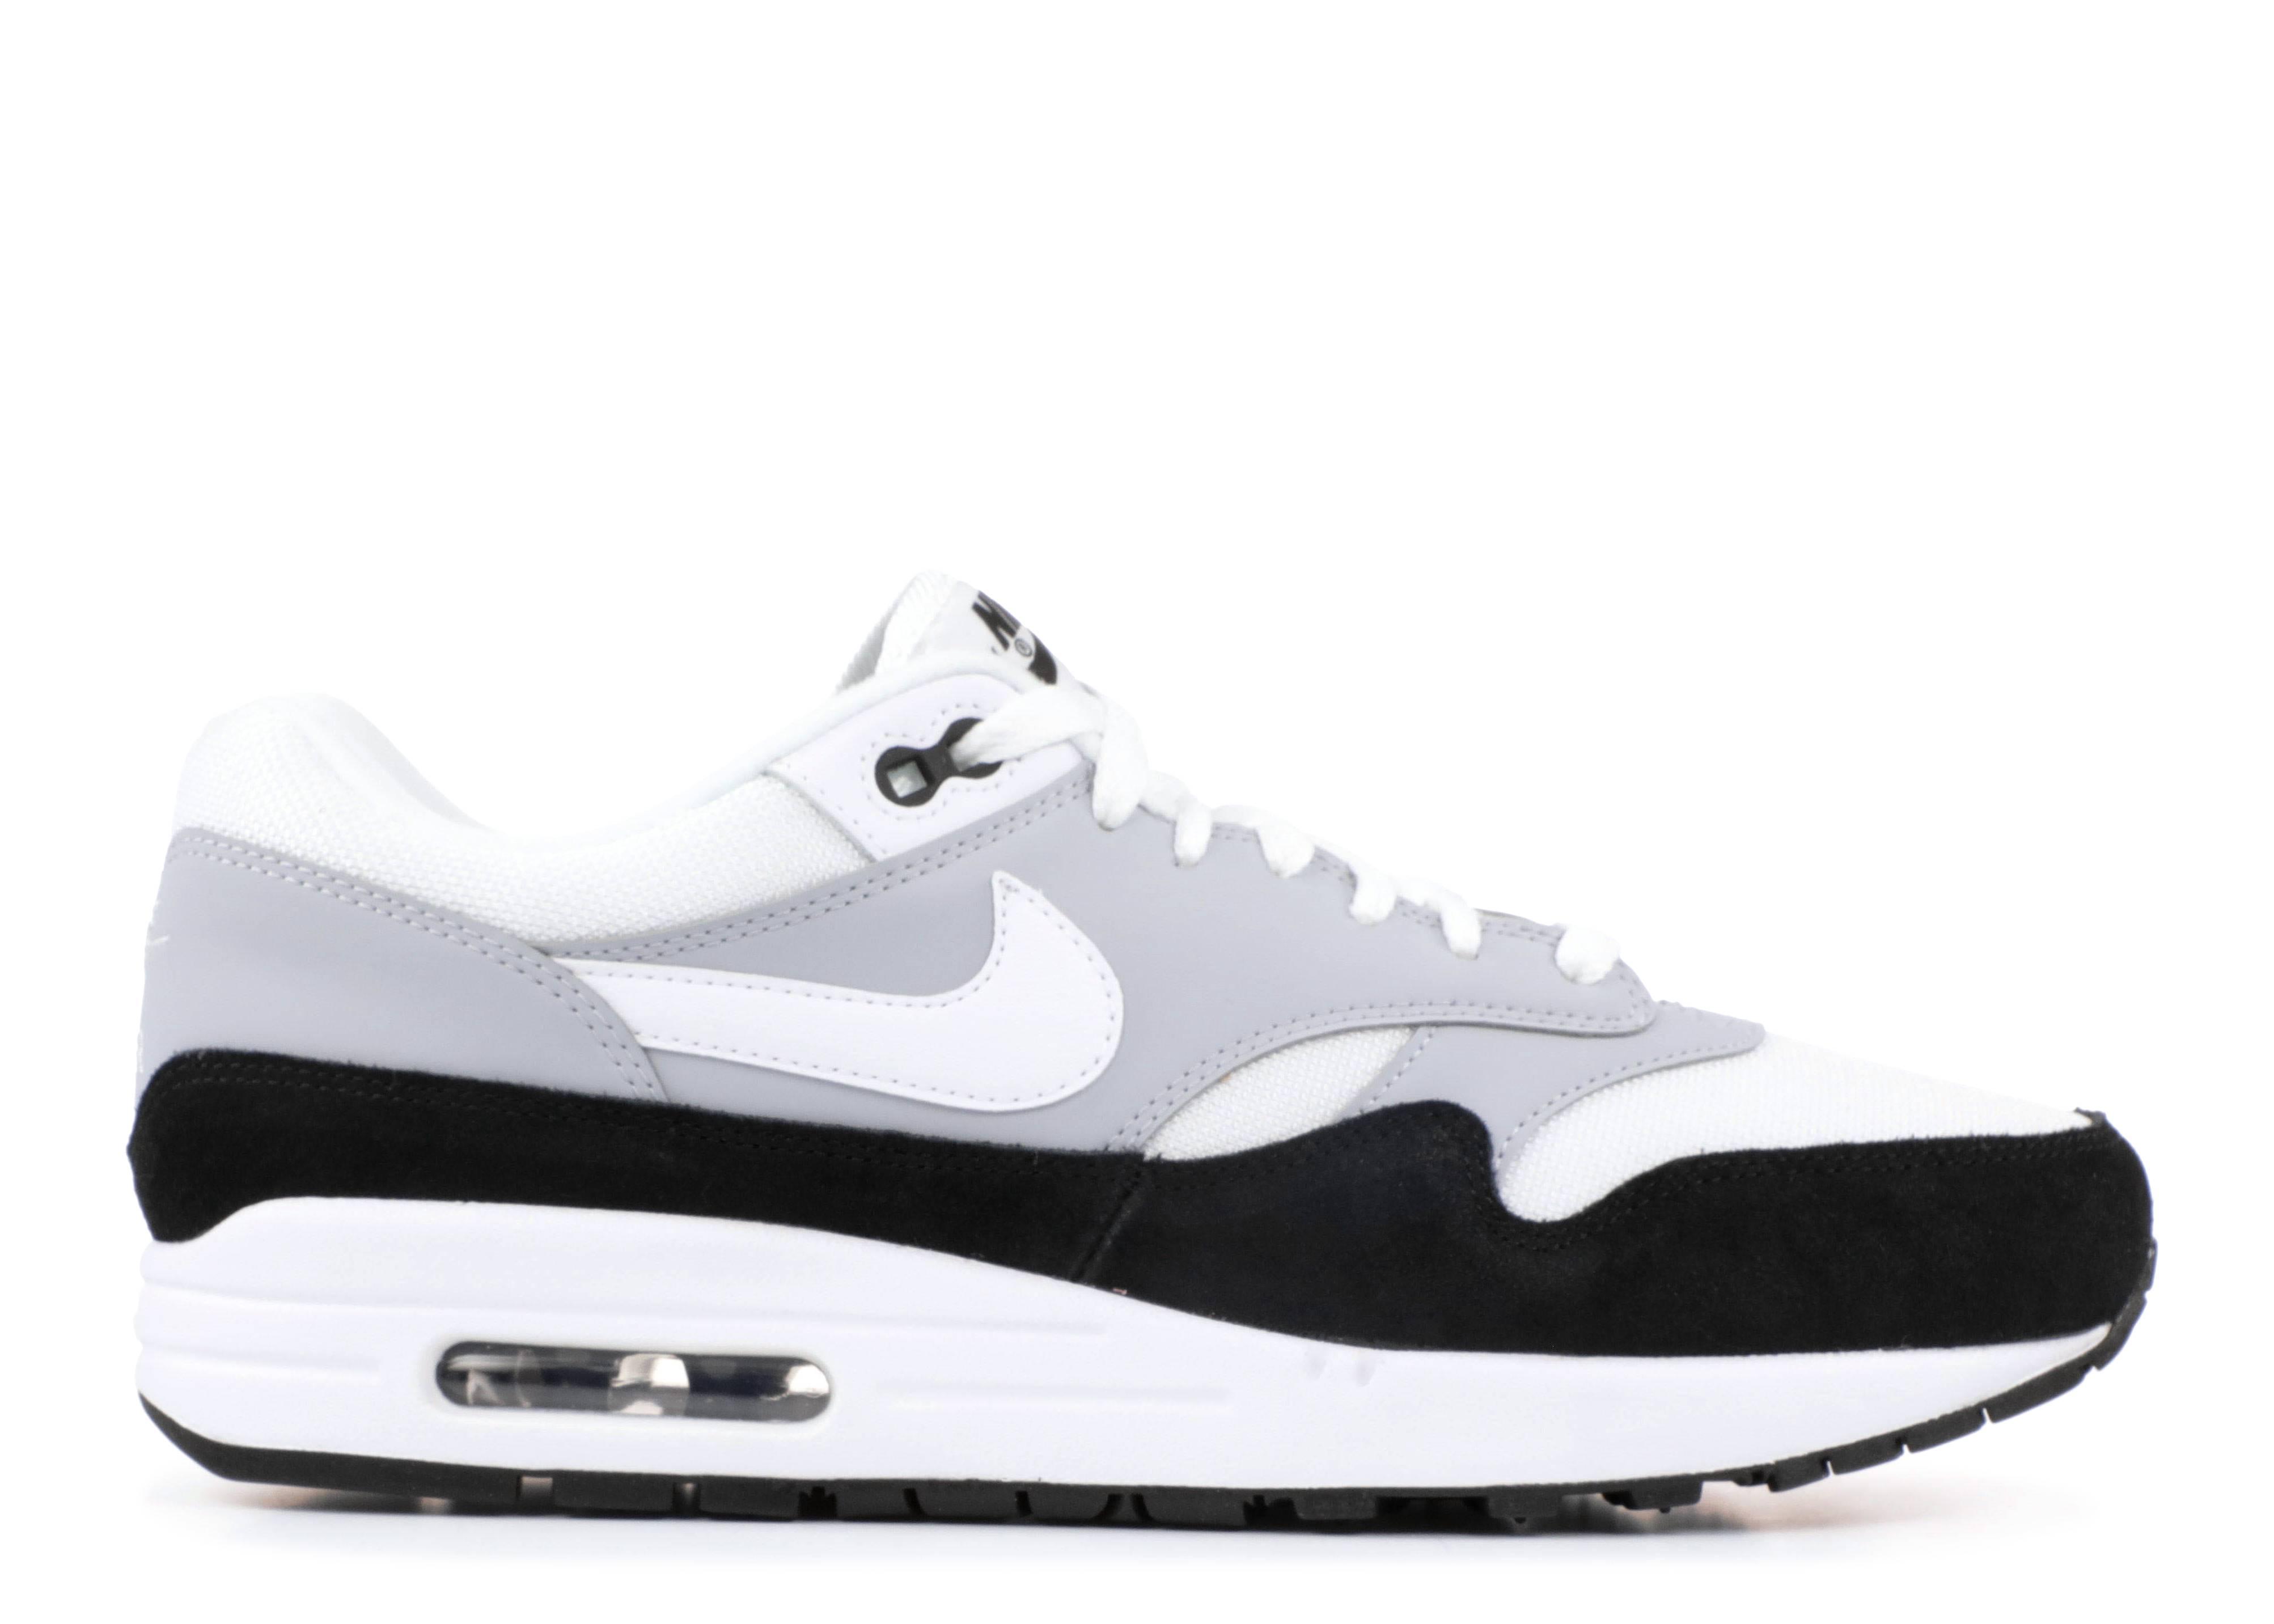 Air Max 1 'Wolf Grey' - Nike - AH8145 003 - wolf grey/white/black ...